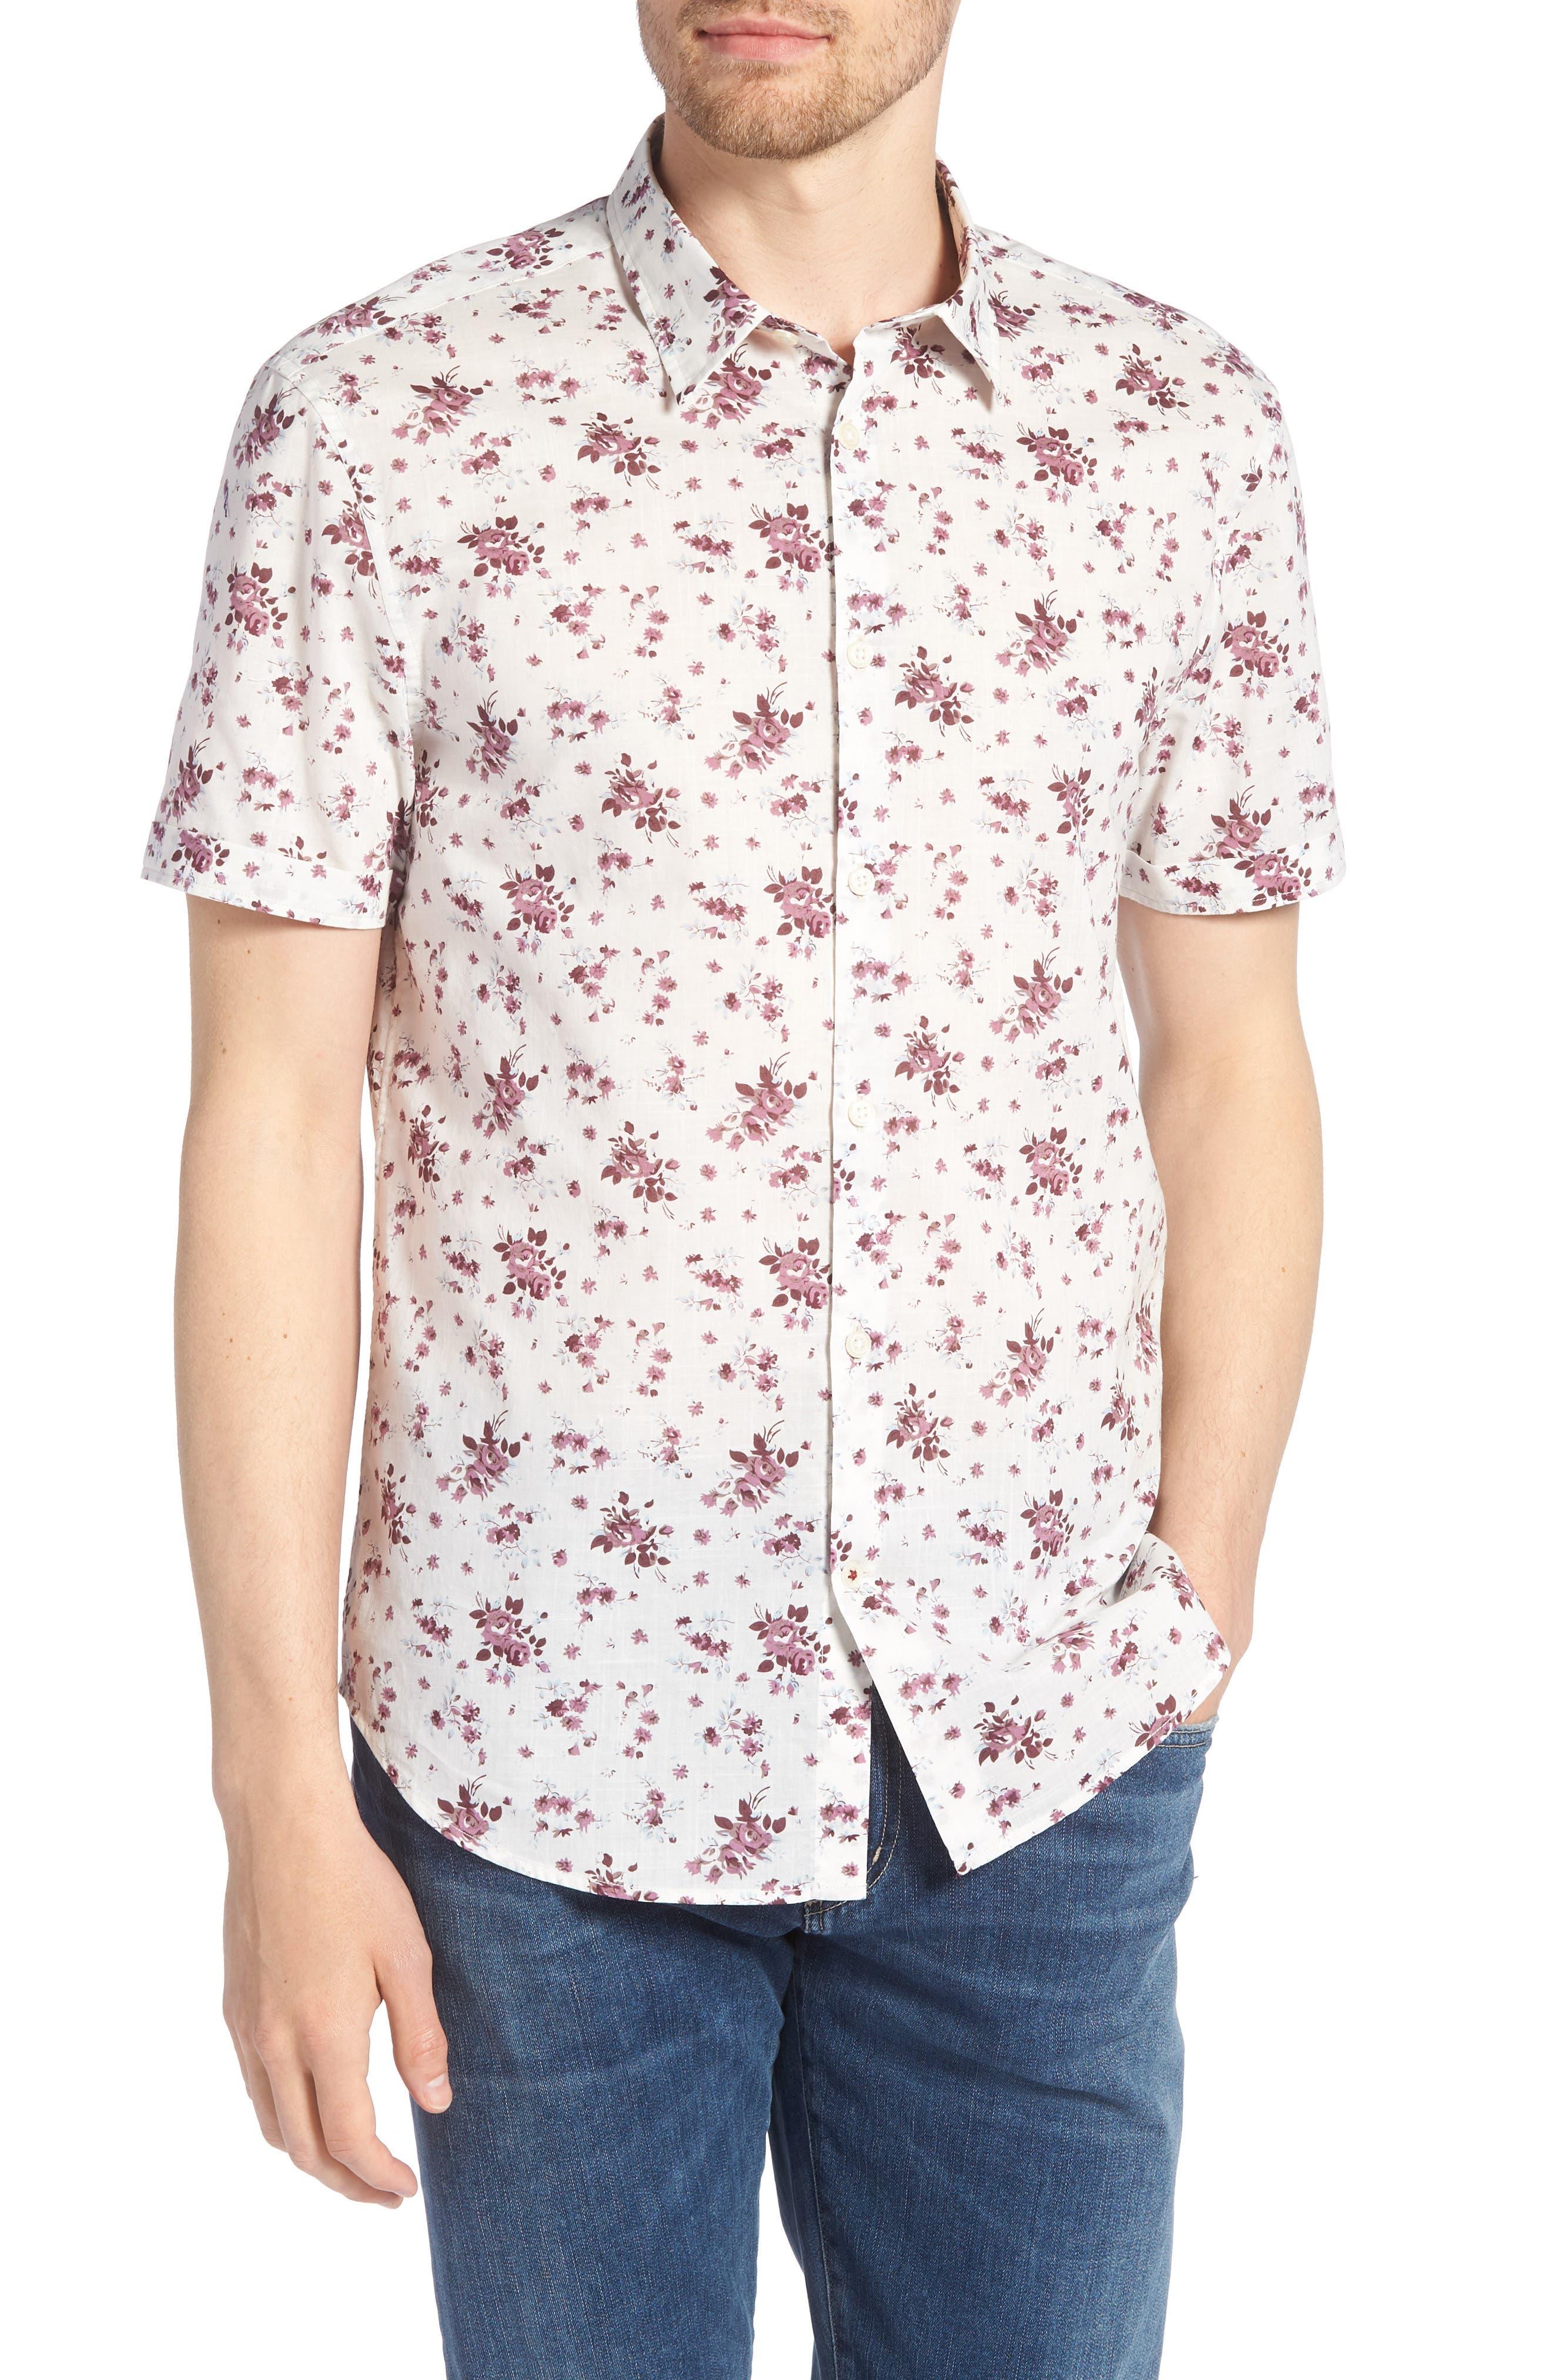 Regular Fit Floral Woven Shirt,                             Main thumbnail 1, color,                             661